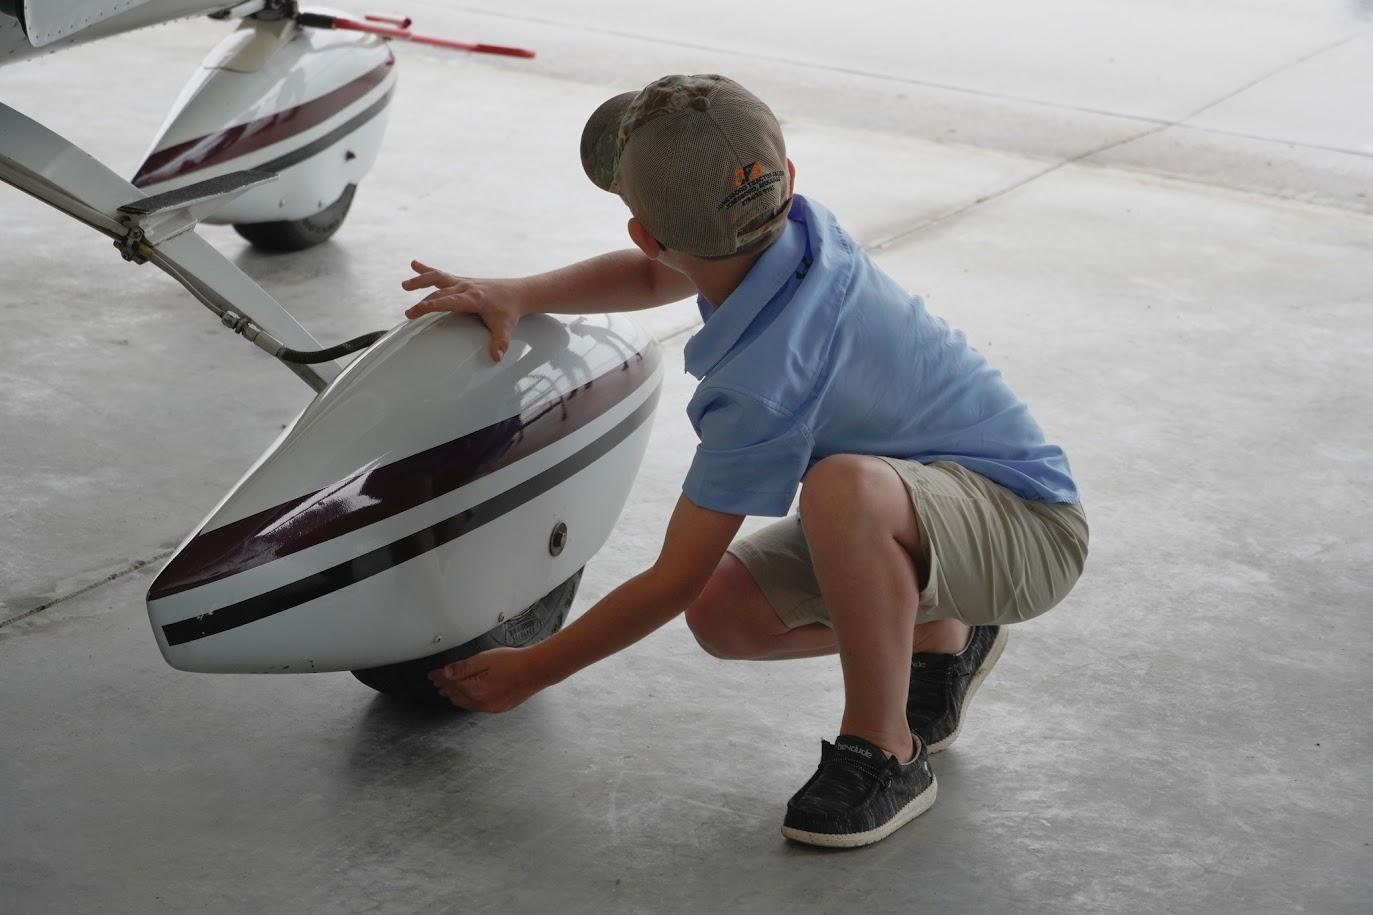 Checking Tire during preflight